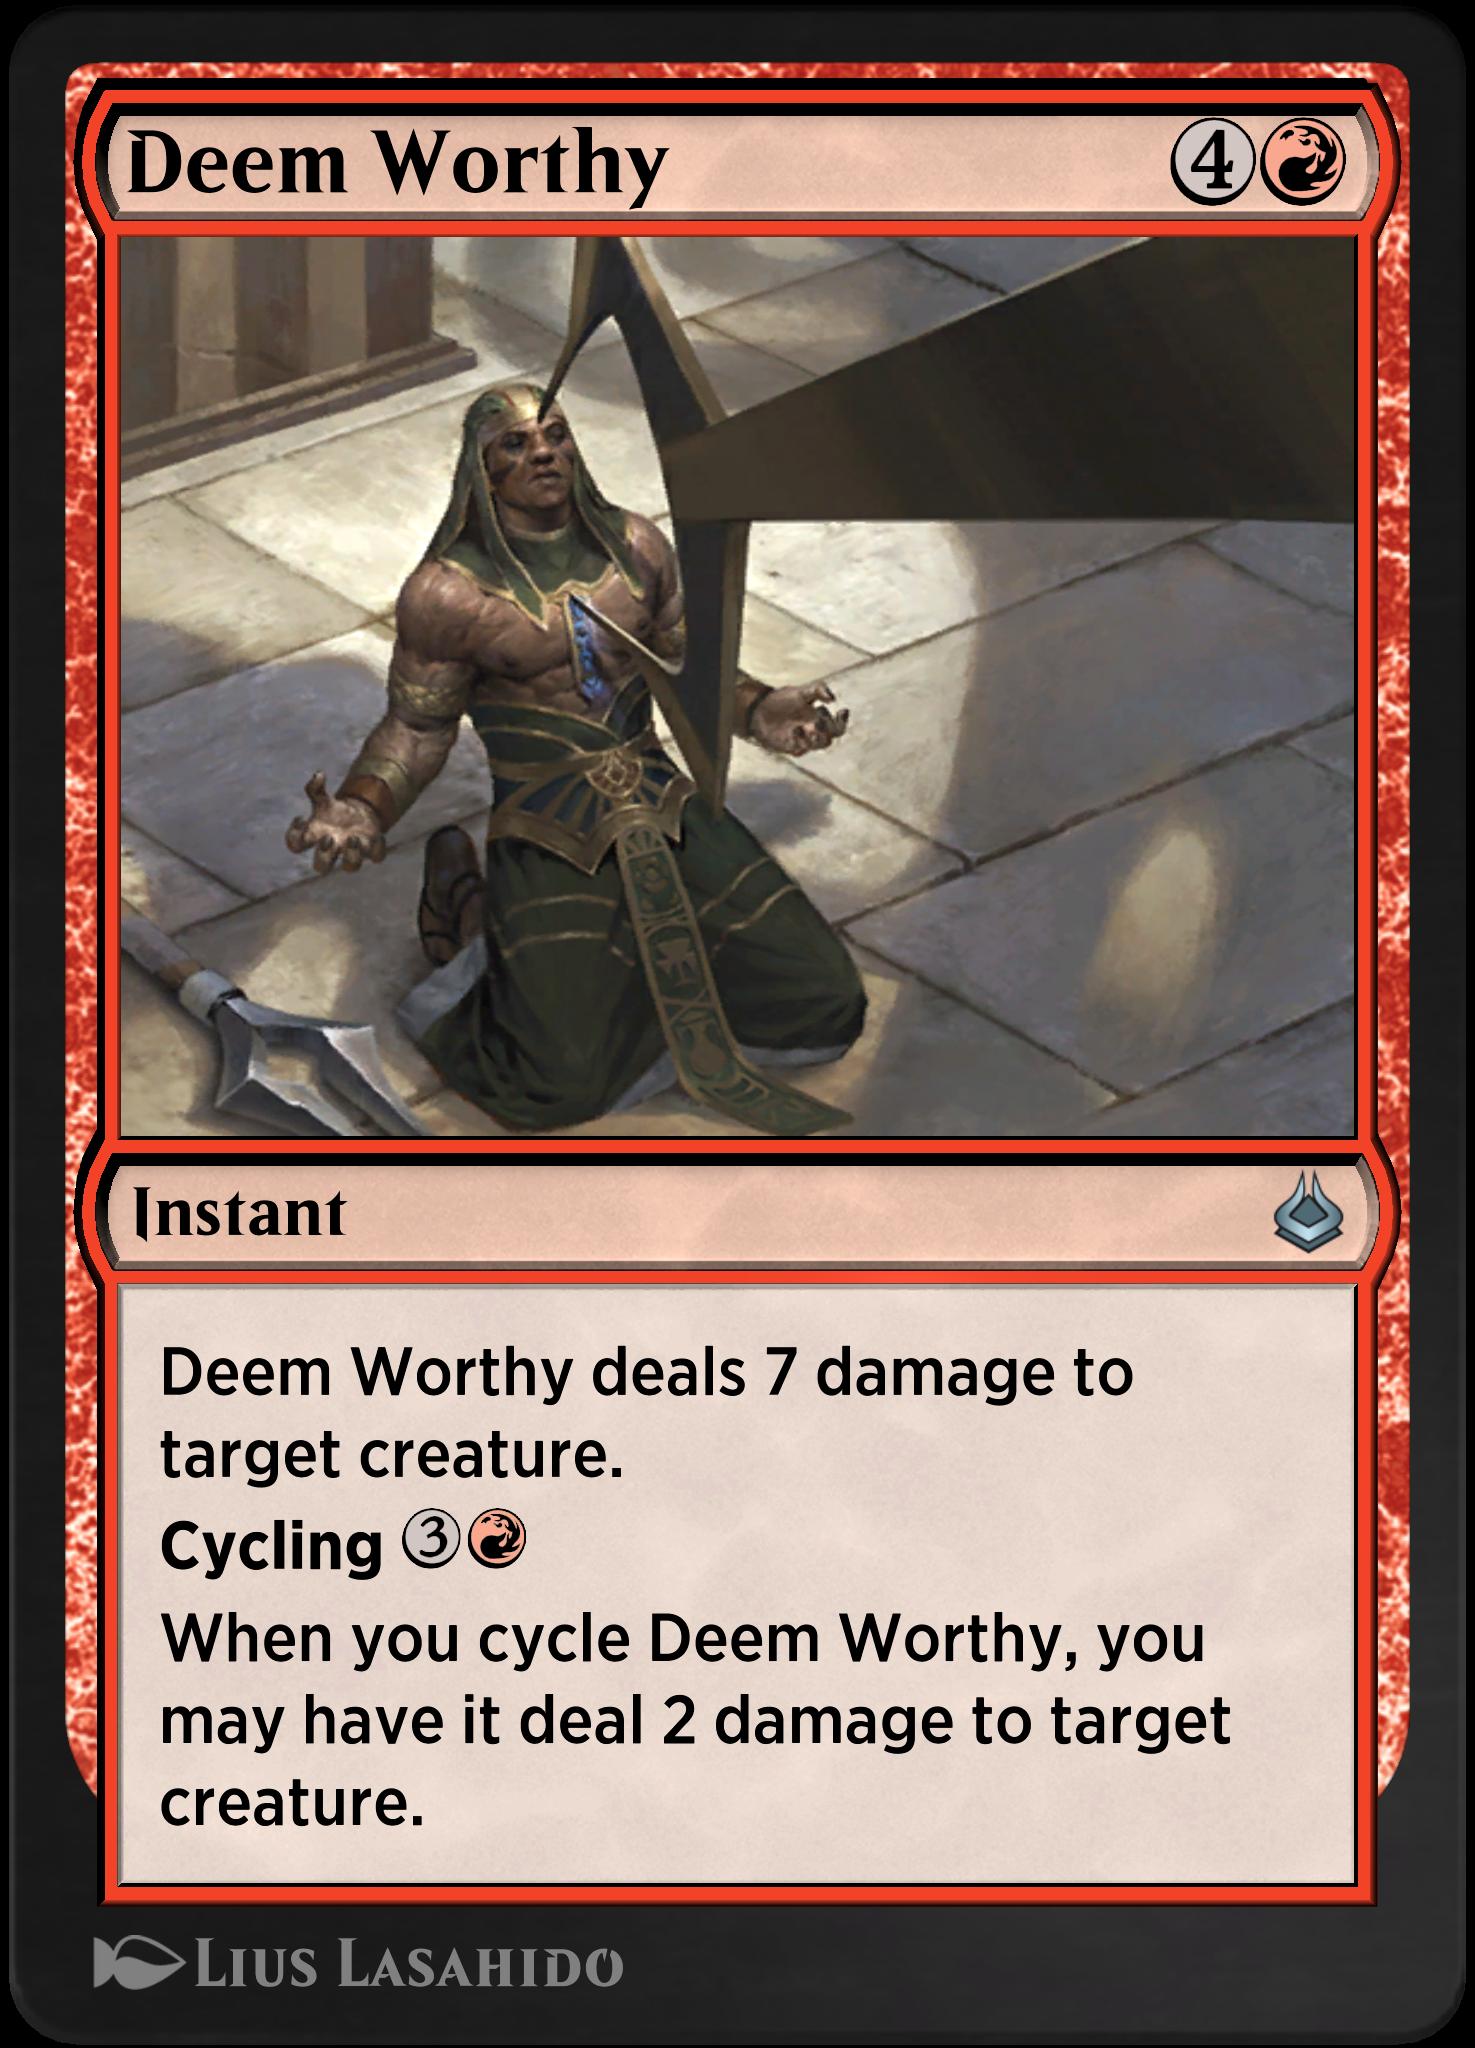 Deem Worthy